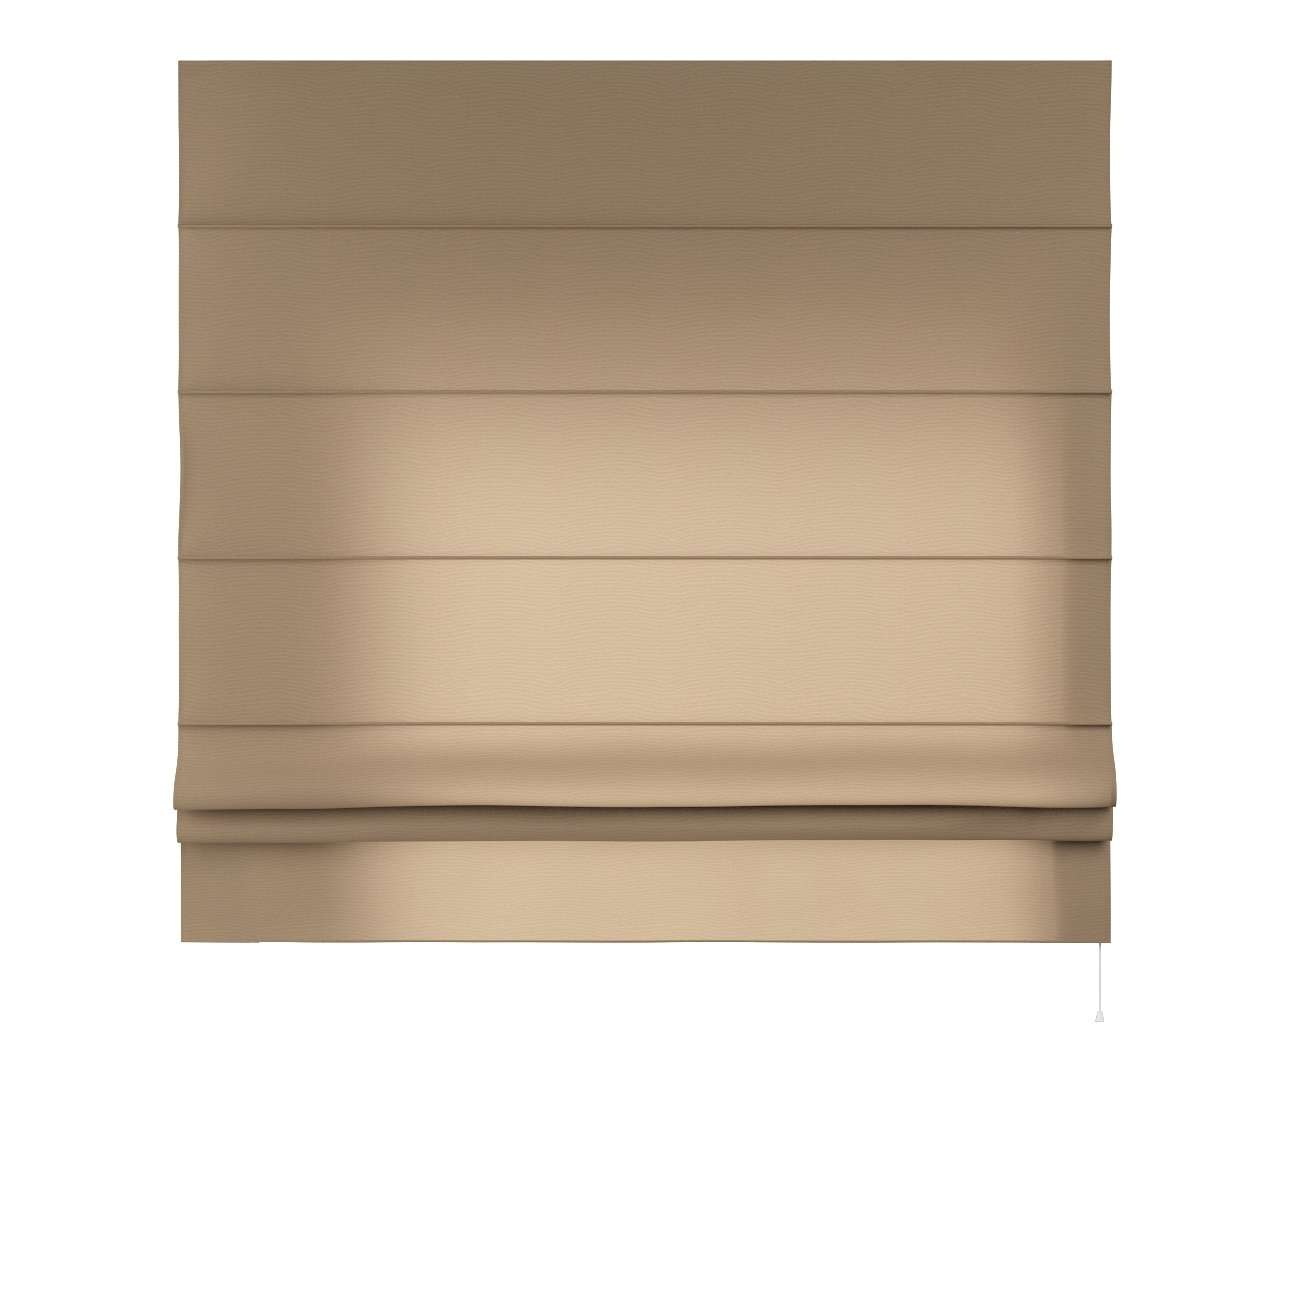 Padva roman blind  80 x 170 cm (31.5 x 67 inch) in collection Quadro, fabric: 136-09